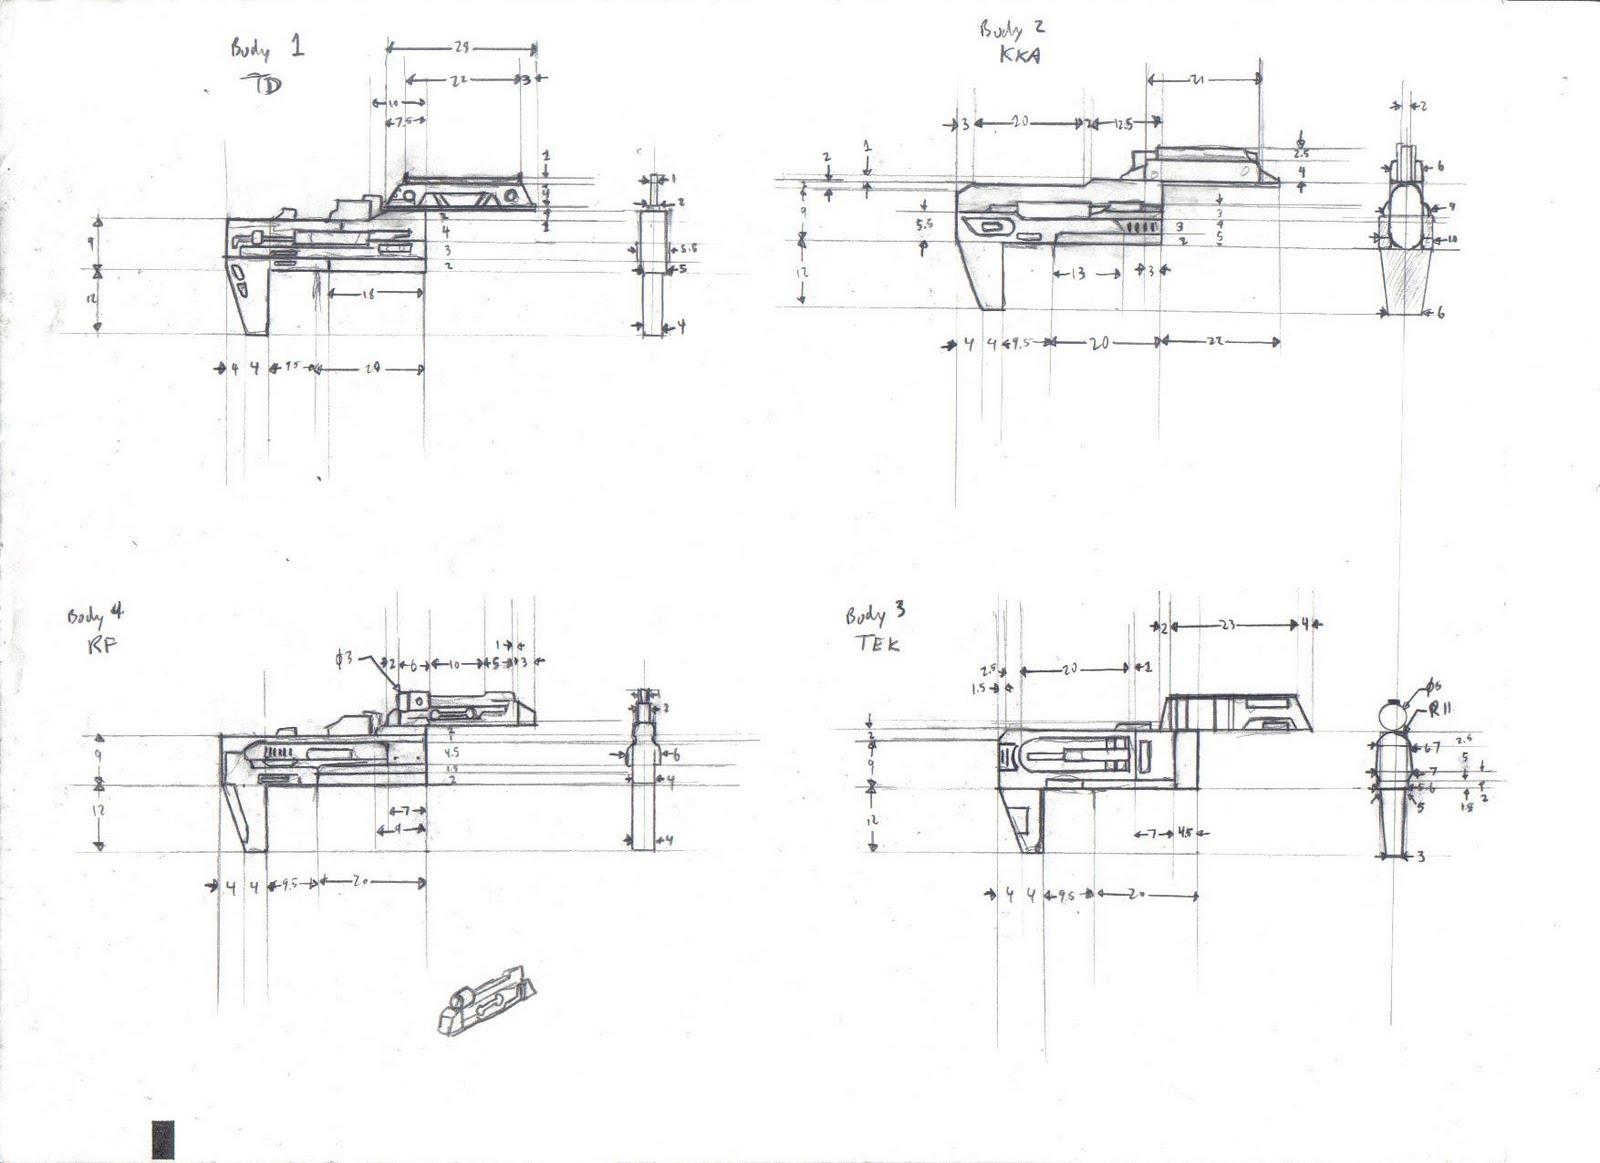 fn p90 diagram wiring diagram third level rh p 90 wirig diagram grease gun diagram glock [ 1600 x 1163 Pixel ]